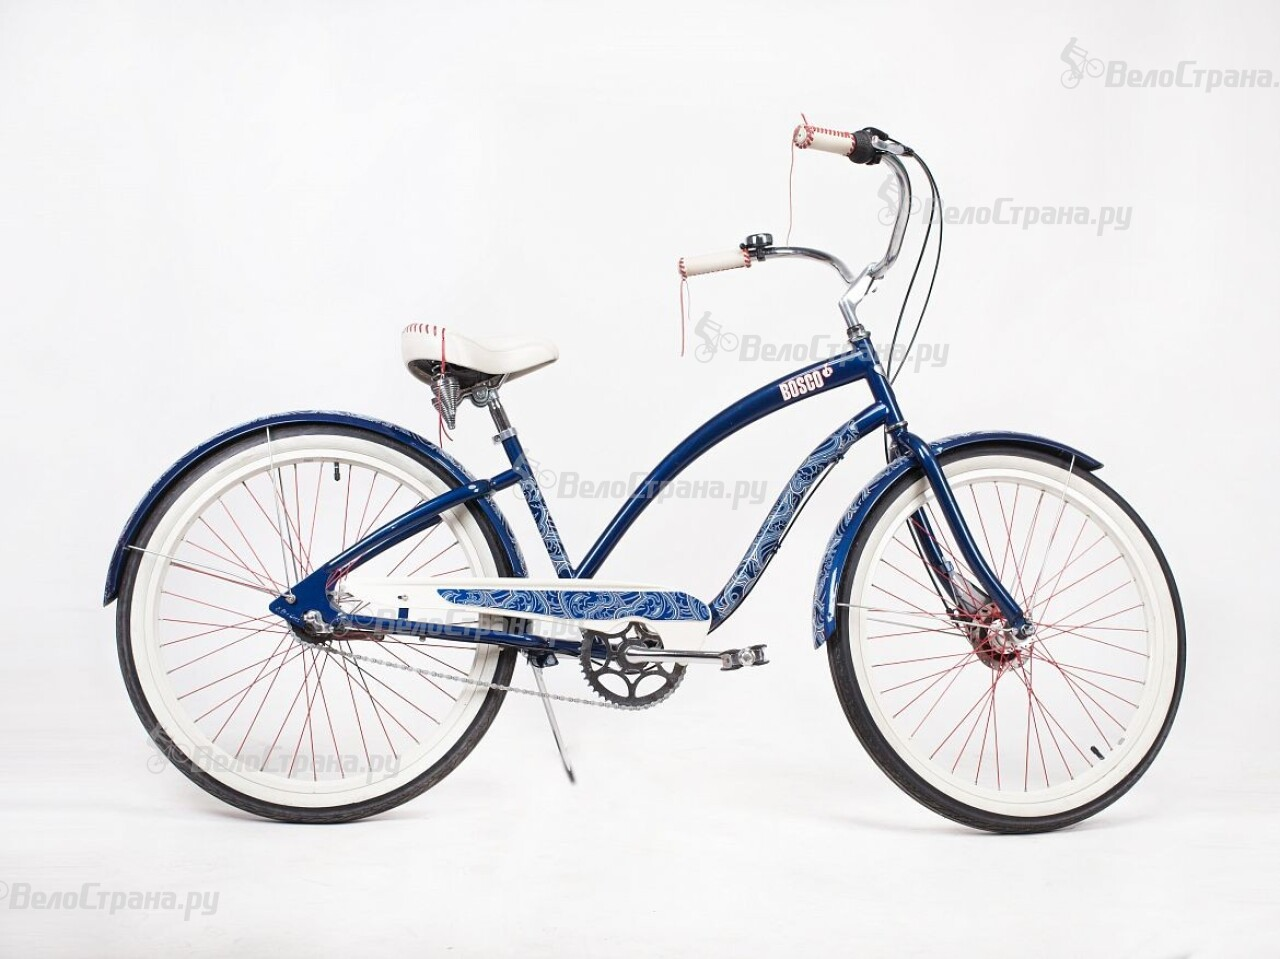 Велосипед Electra Cruiser Bosco 3i Ladies' (2016) mourning becomes electra